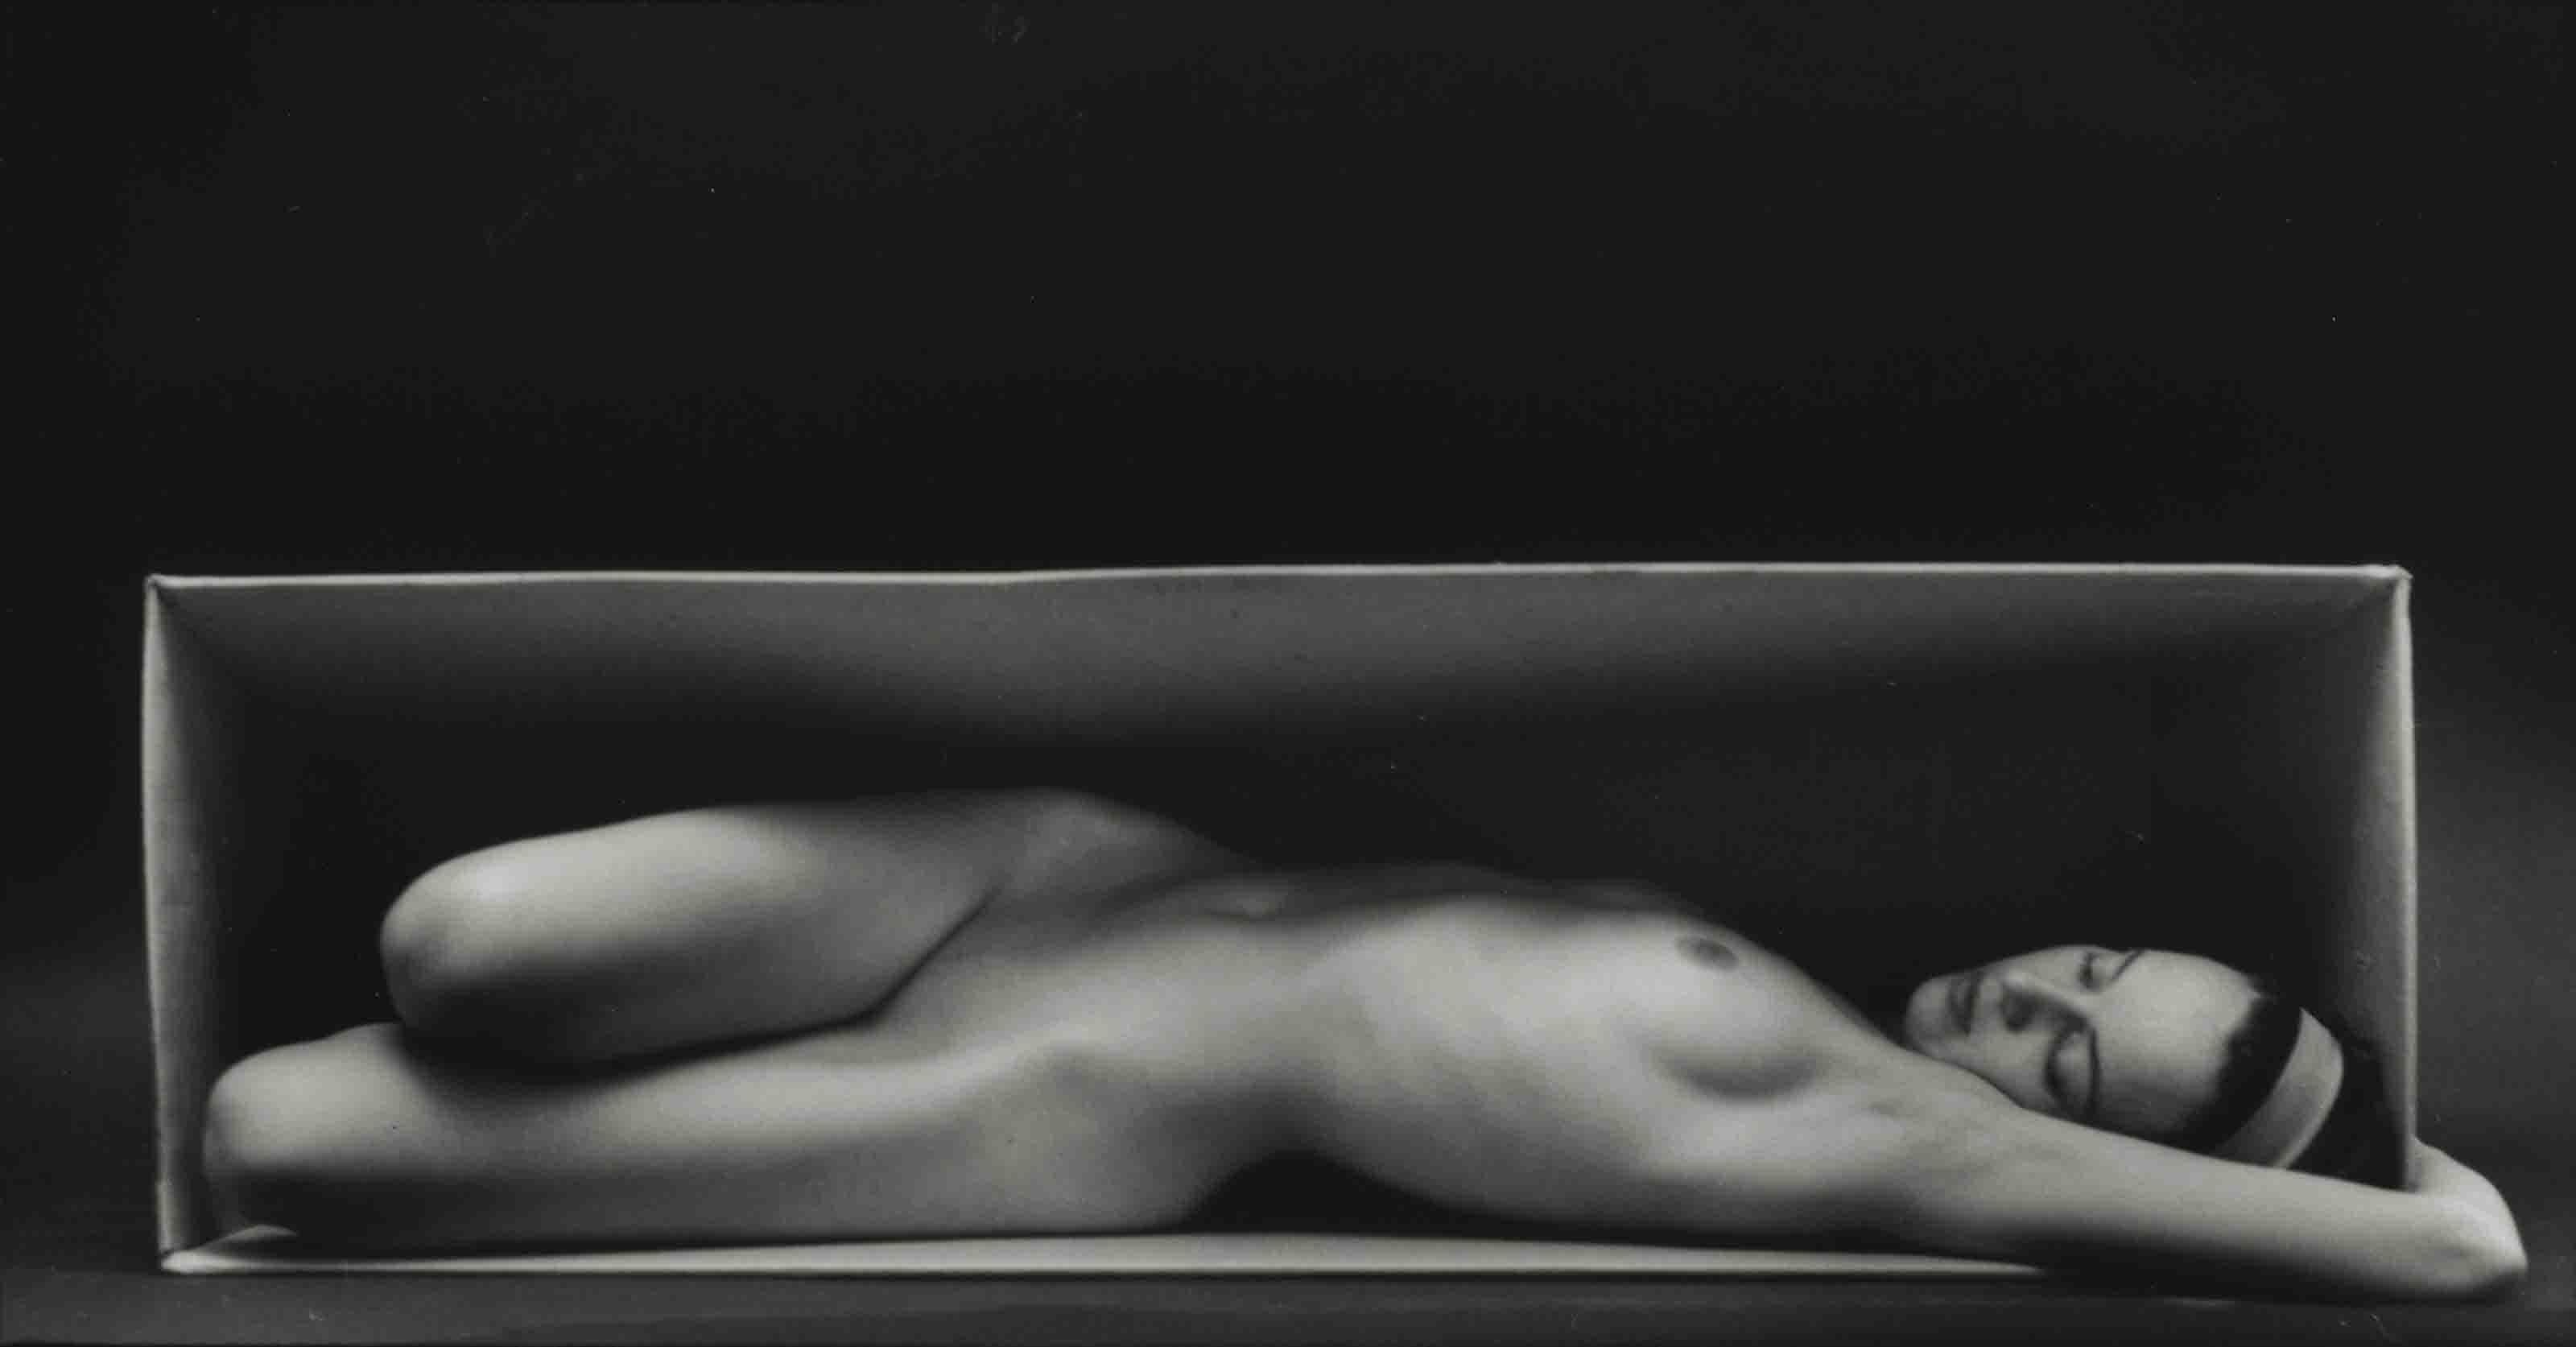 In the Box - horizontal, 1962